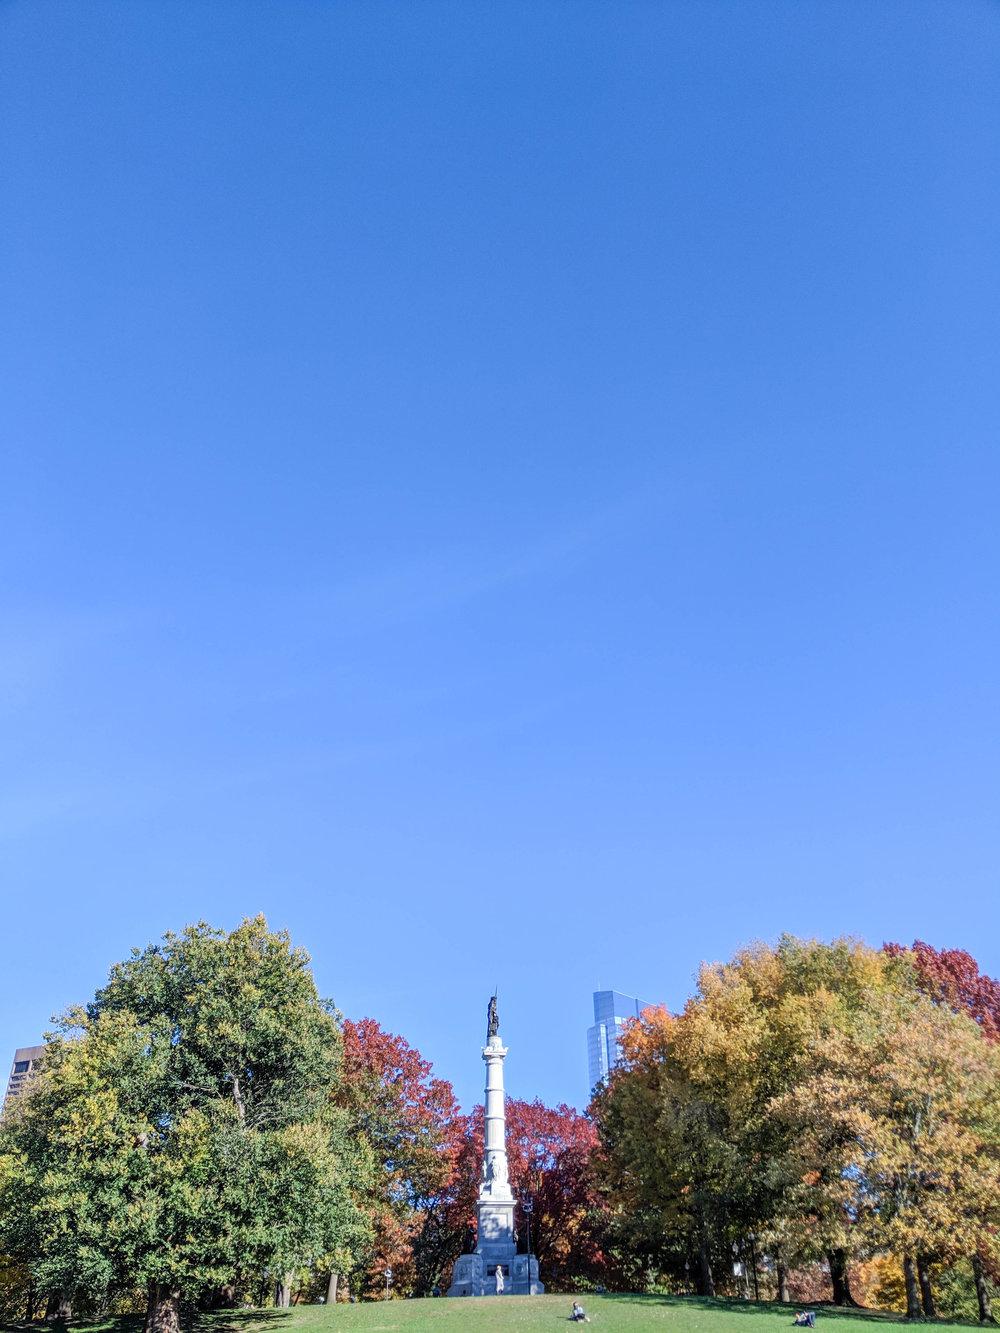 boston; photography; bri rinehart; fall; nature; boston commons